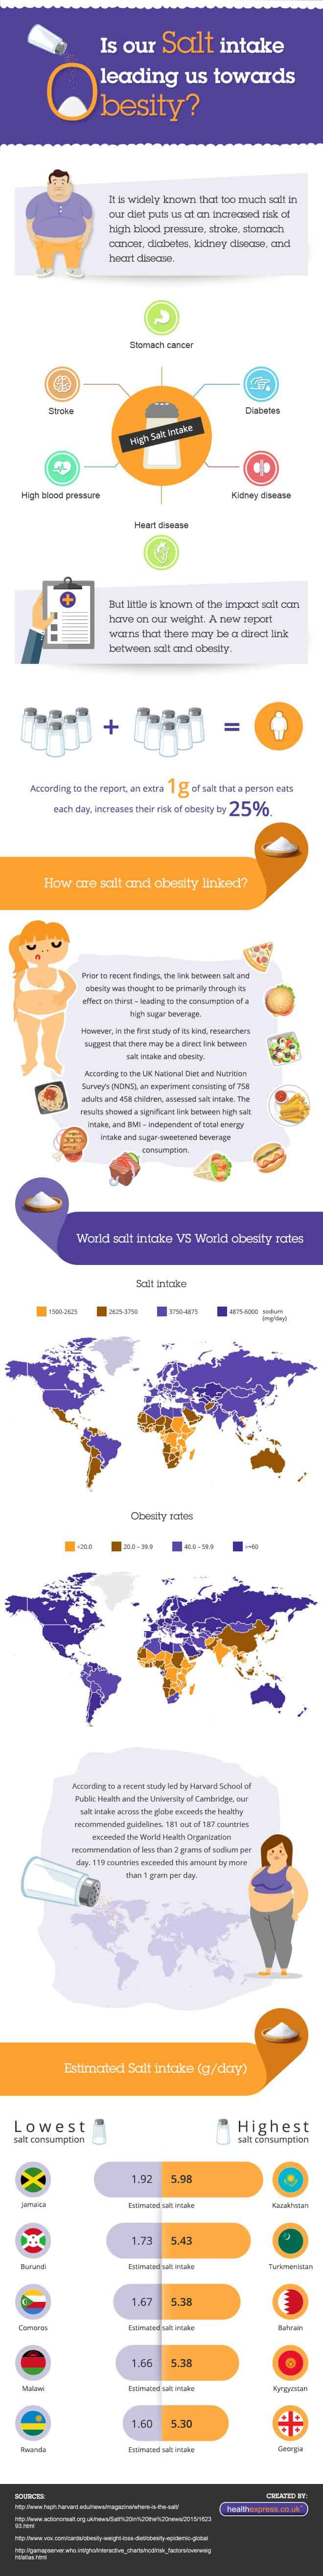 Is Salt Intake Leading Towards Obesity?